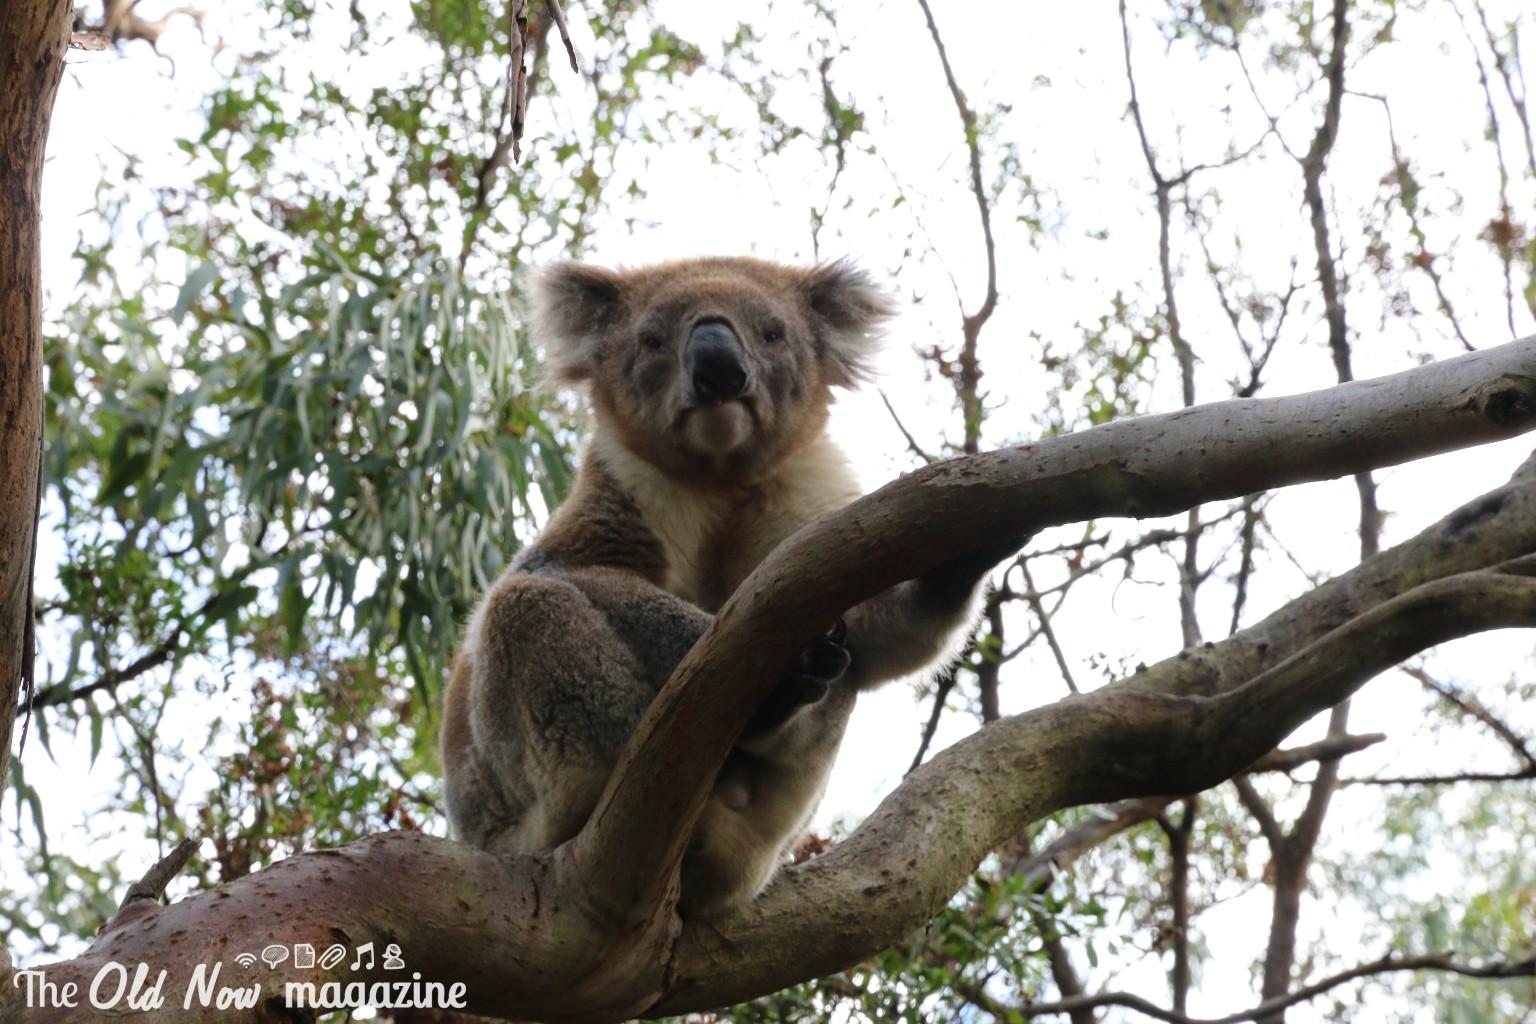 Koala Conservation Centre THEOLDNOW (24)